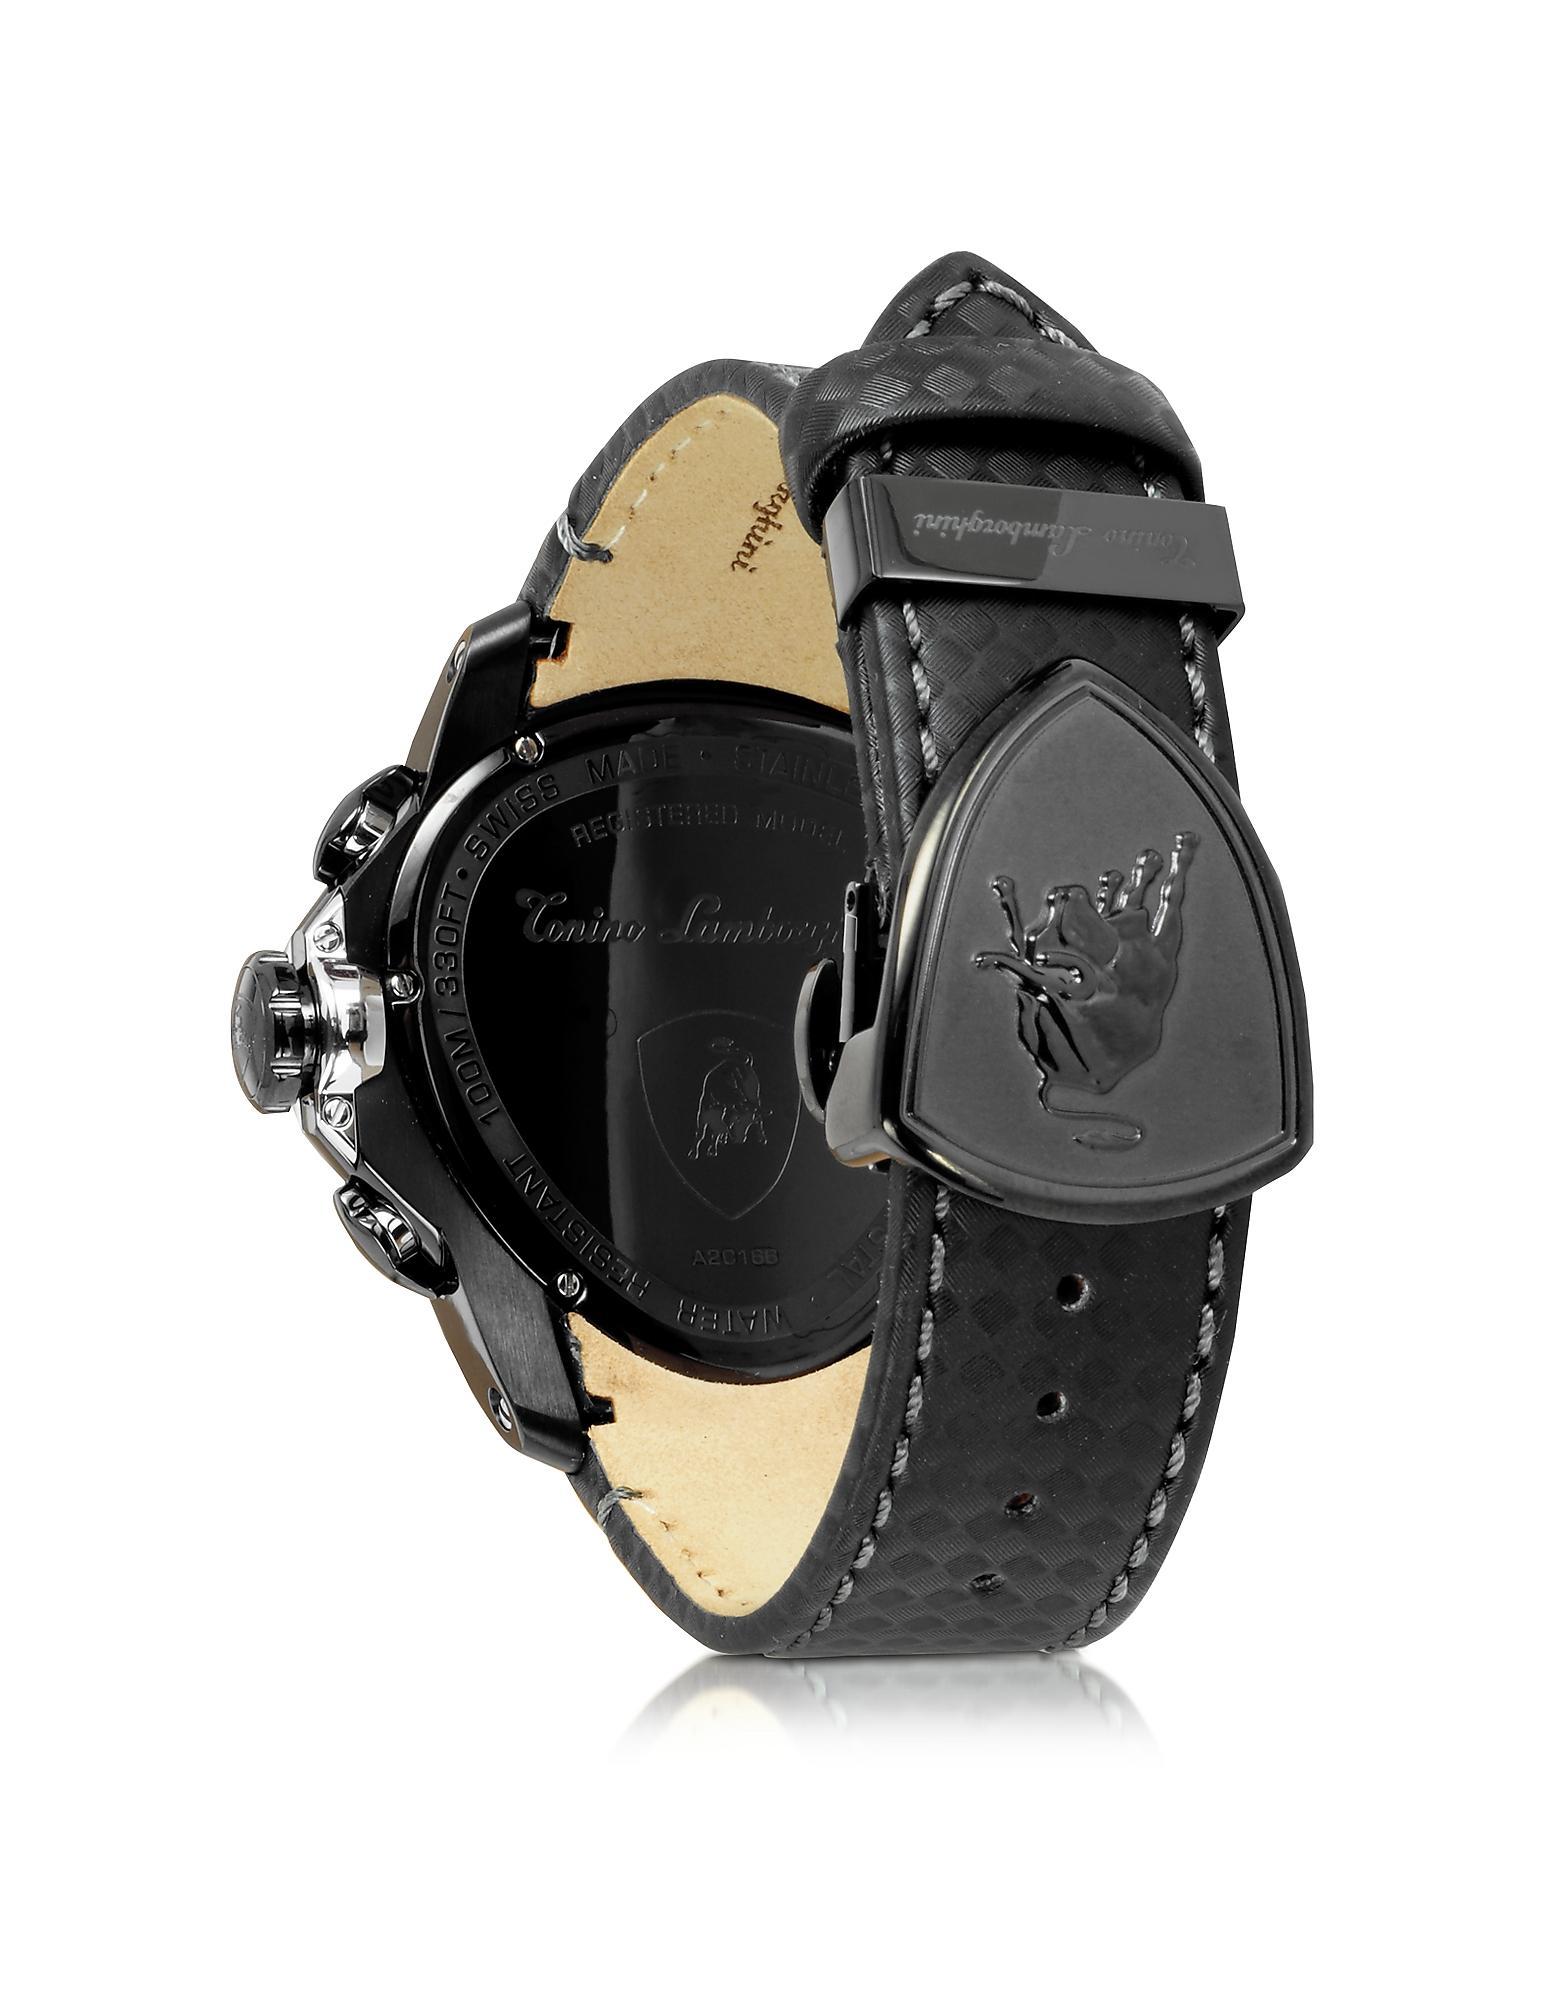 Tonino lamborghini Black Stainless Steel Spyder ...